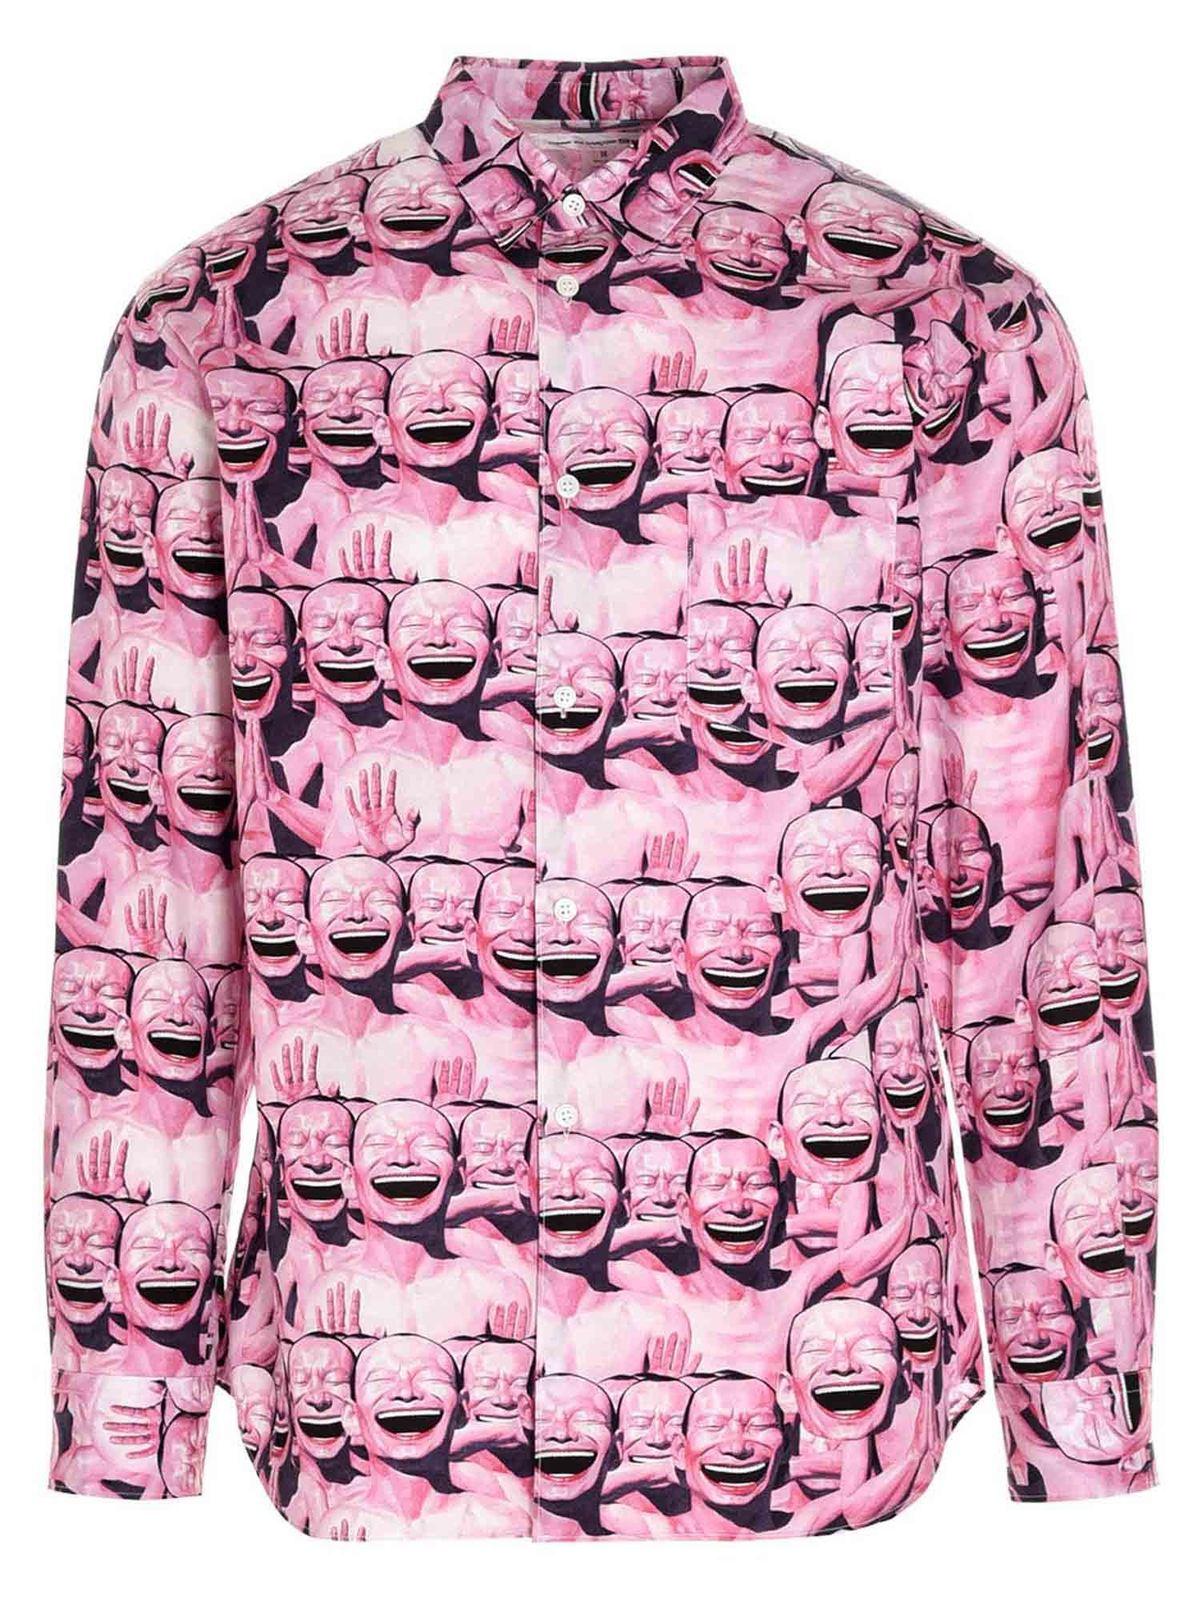 Comme Des Garçons Shirt Clothing YUE MINJUN PRINTED SHIRT IN PINK